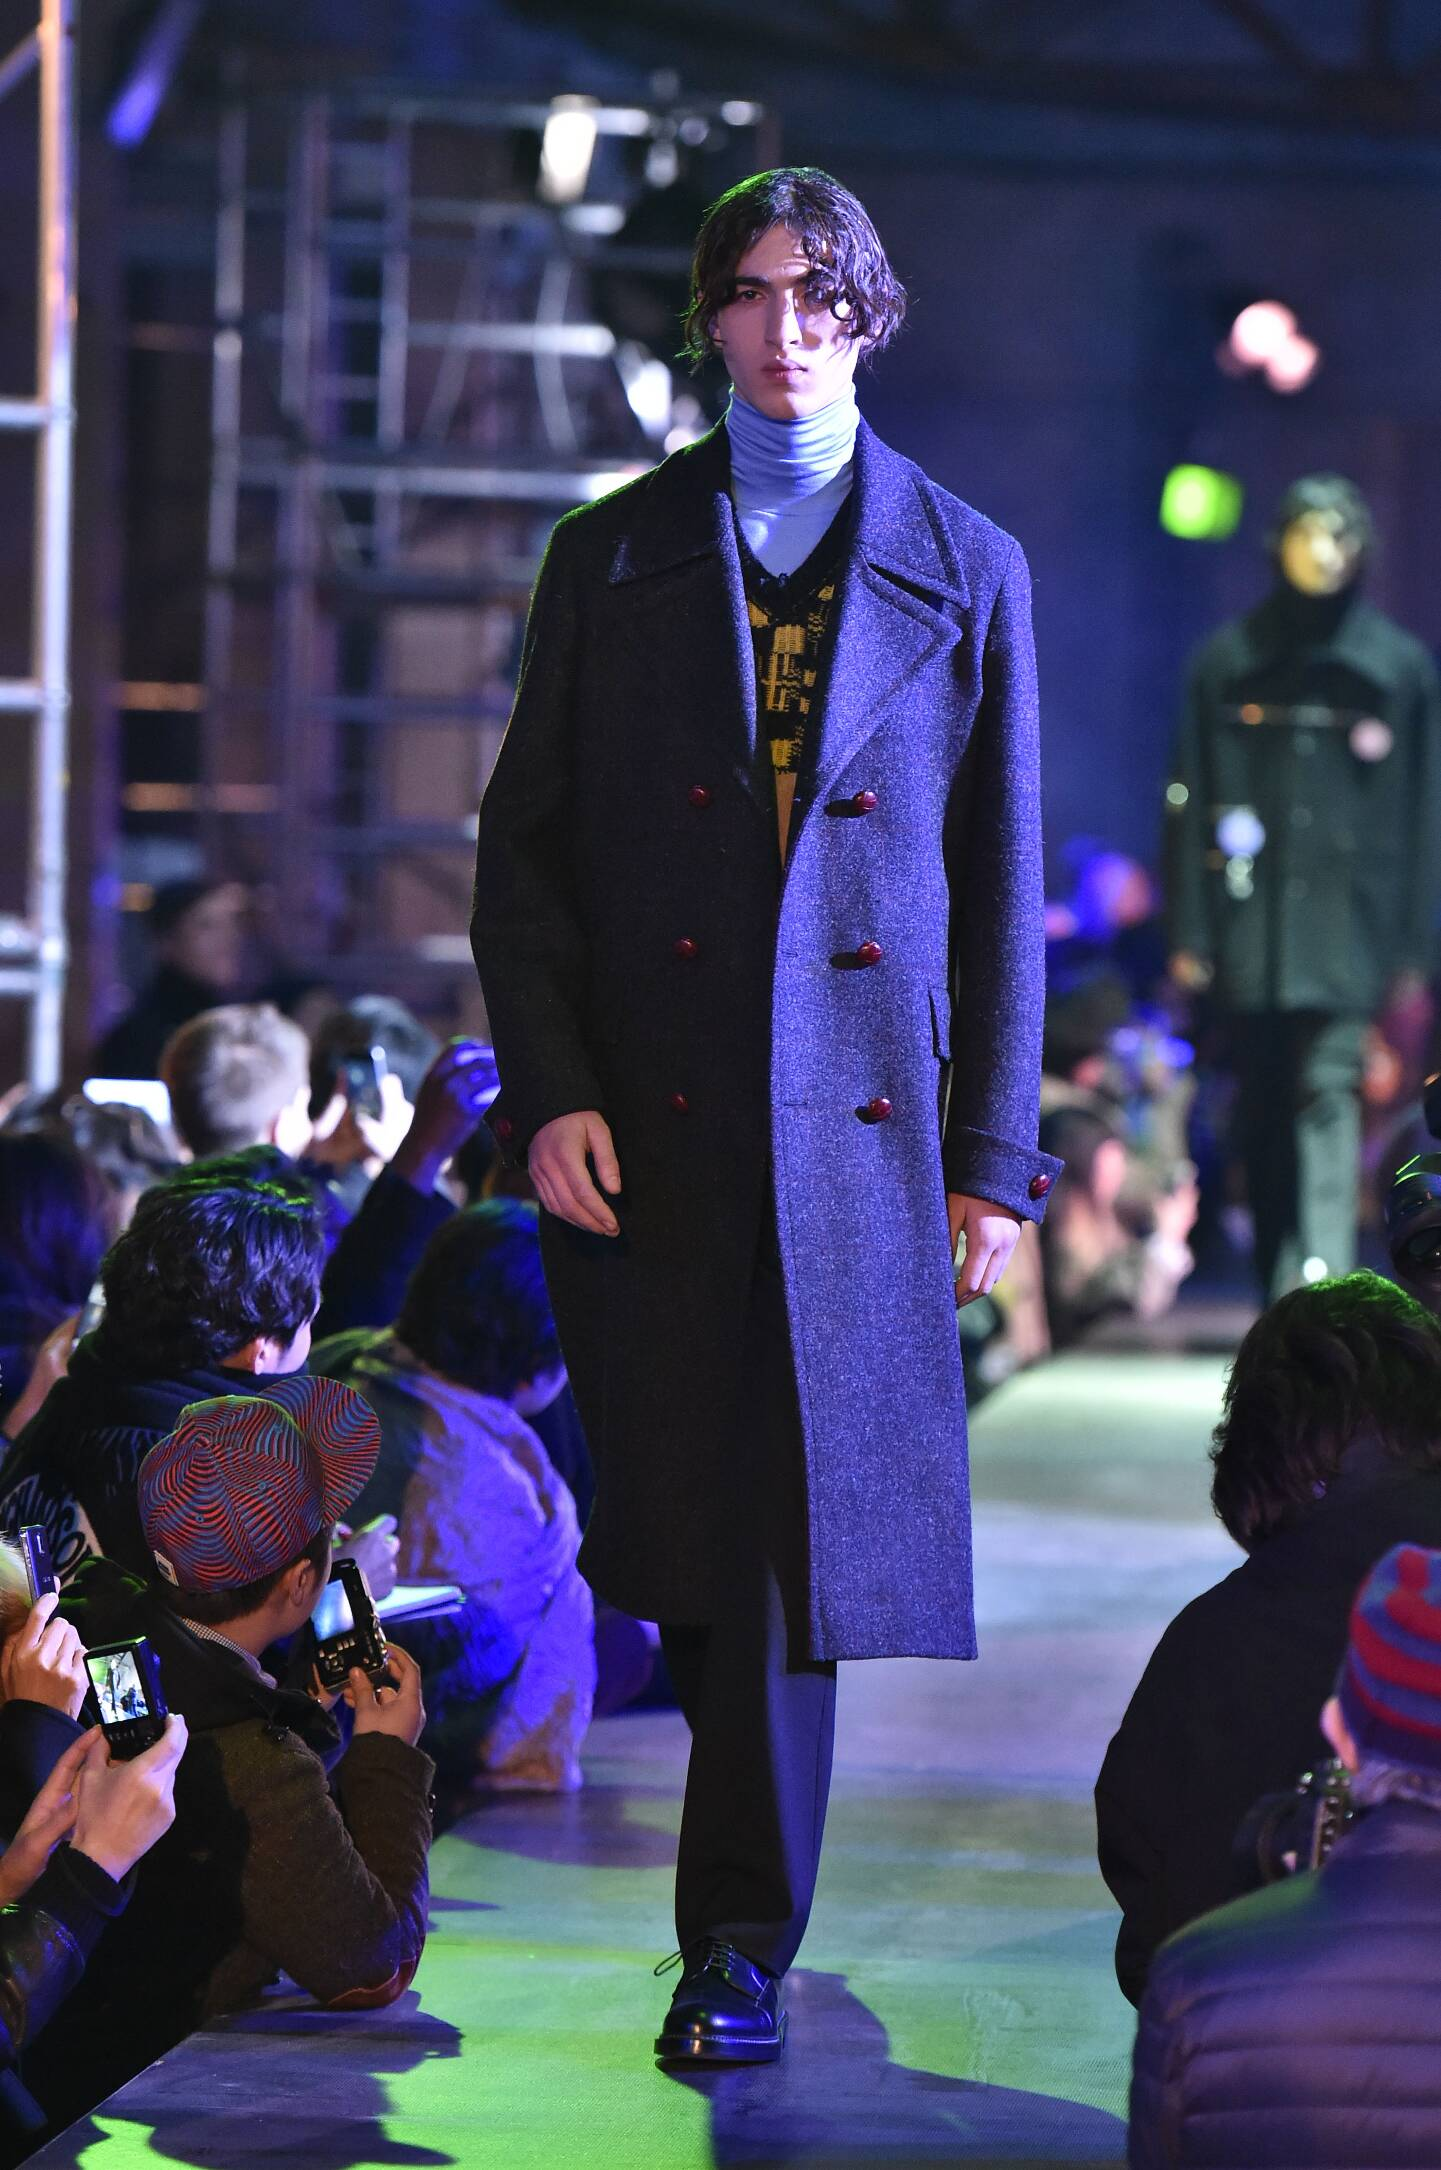 Catwalk Raf Simons Collection Fashion Show Winter 2015